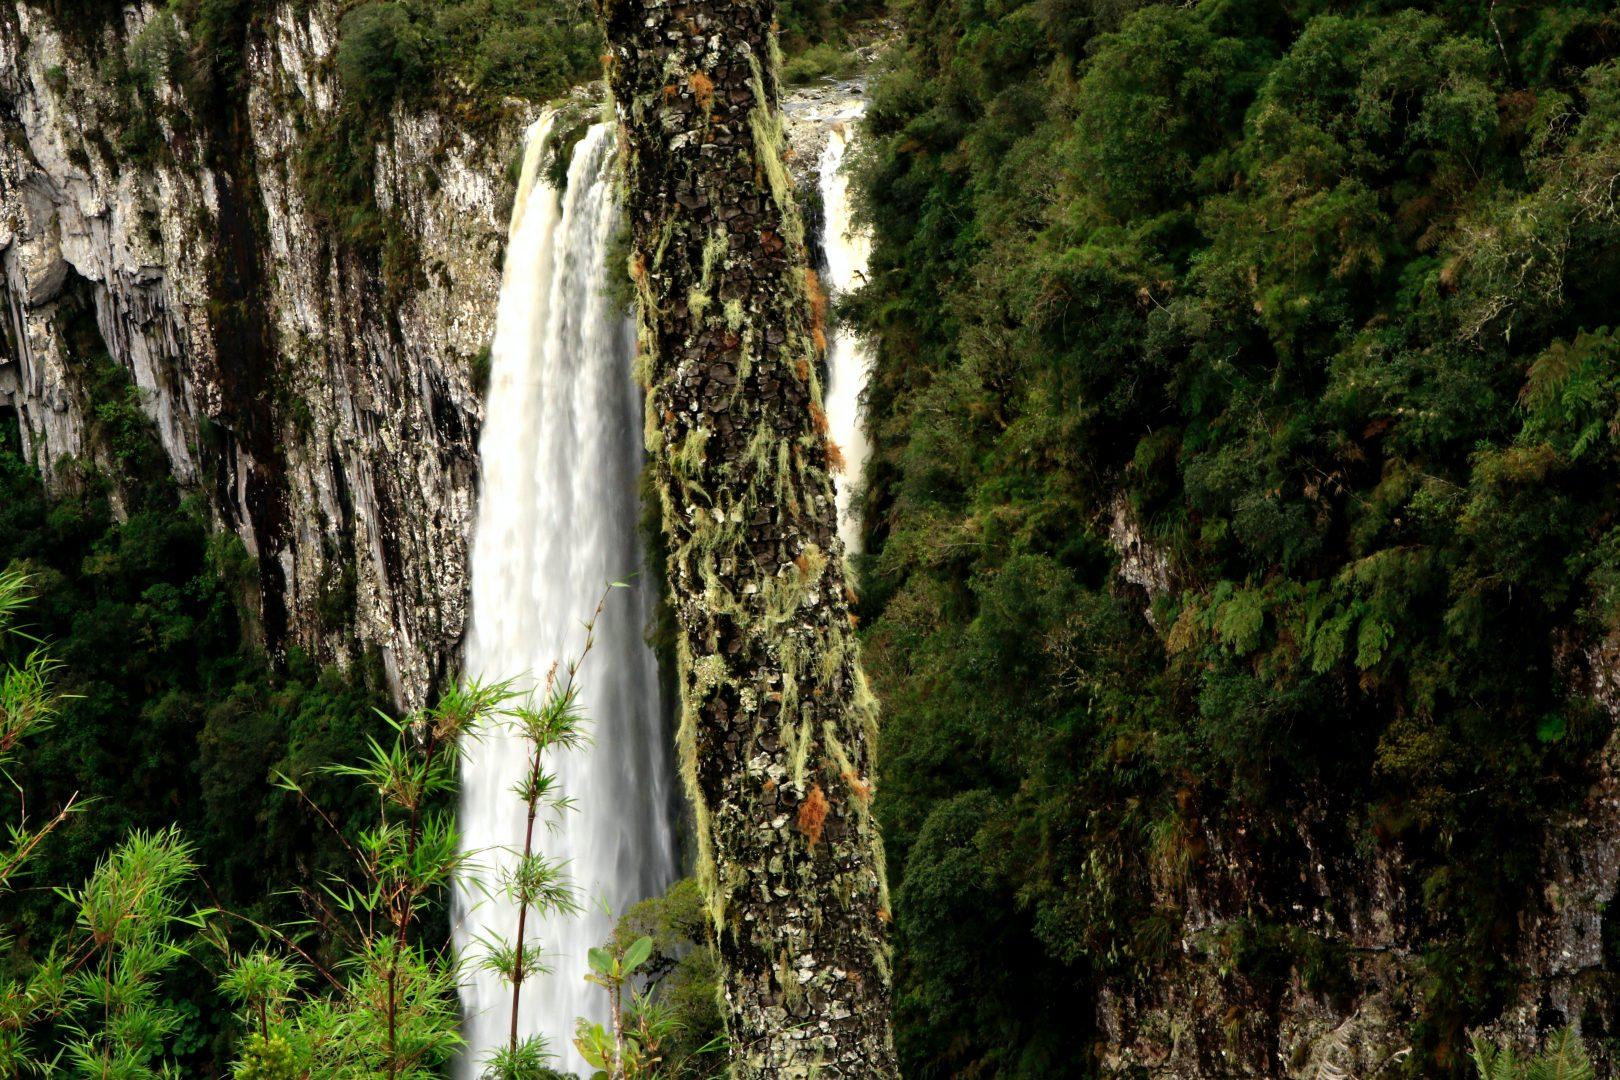 flowing waterfalls near trees during daytime